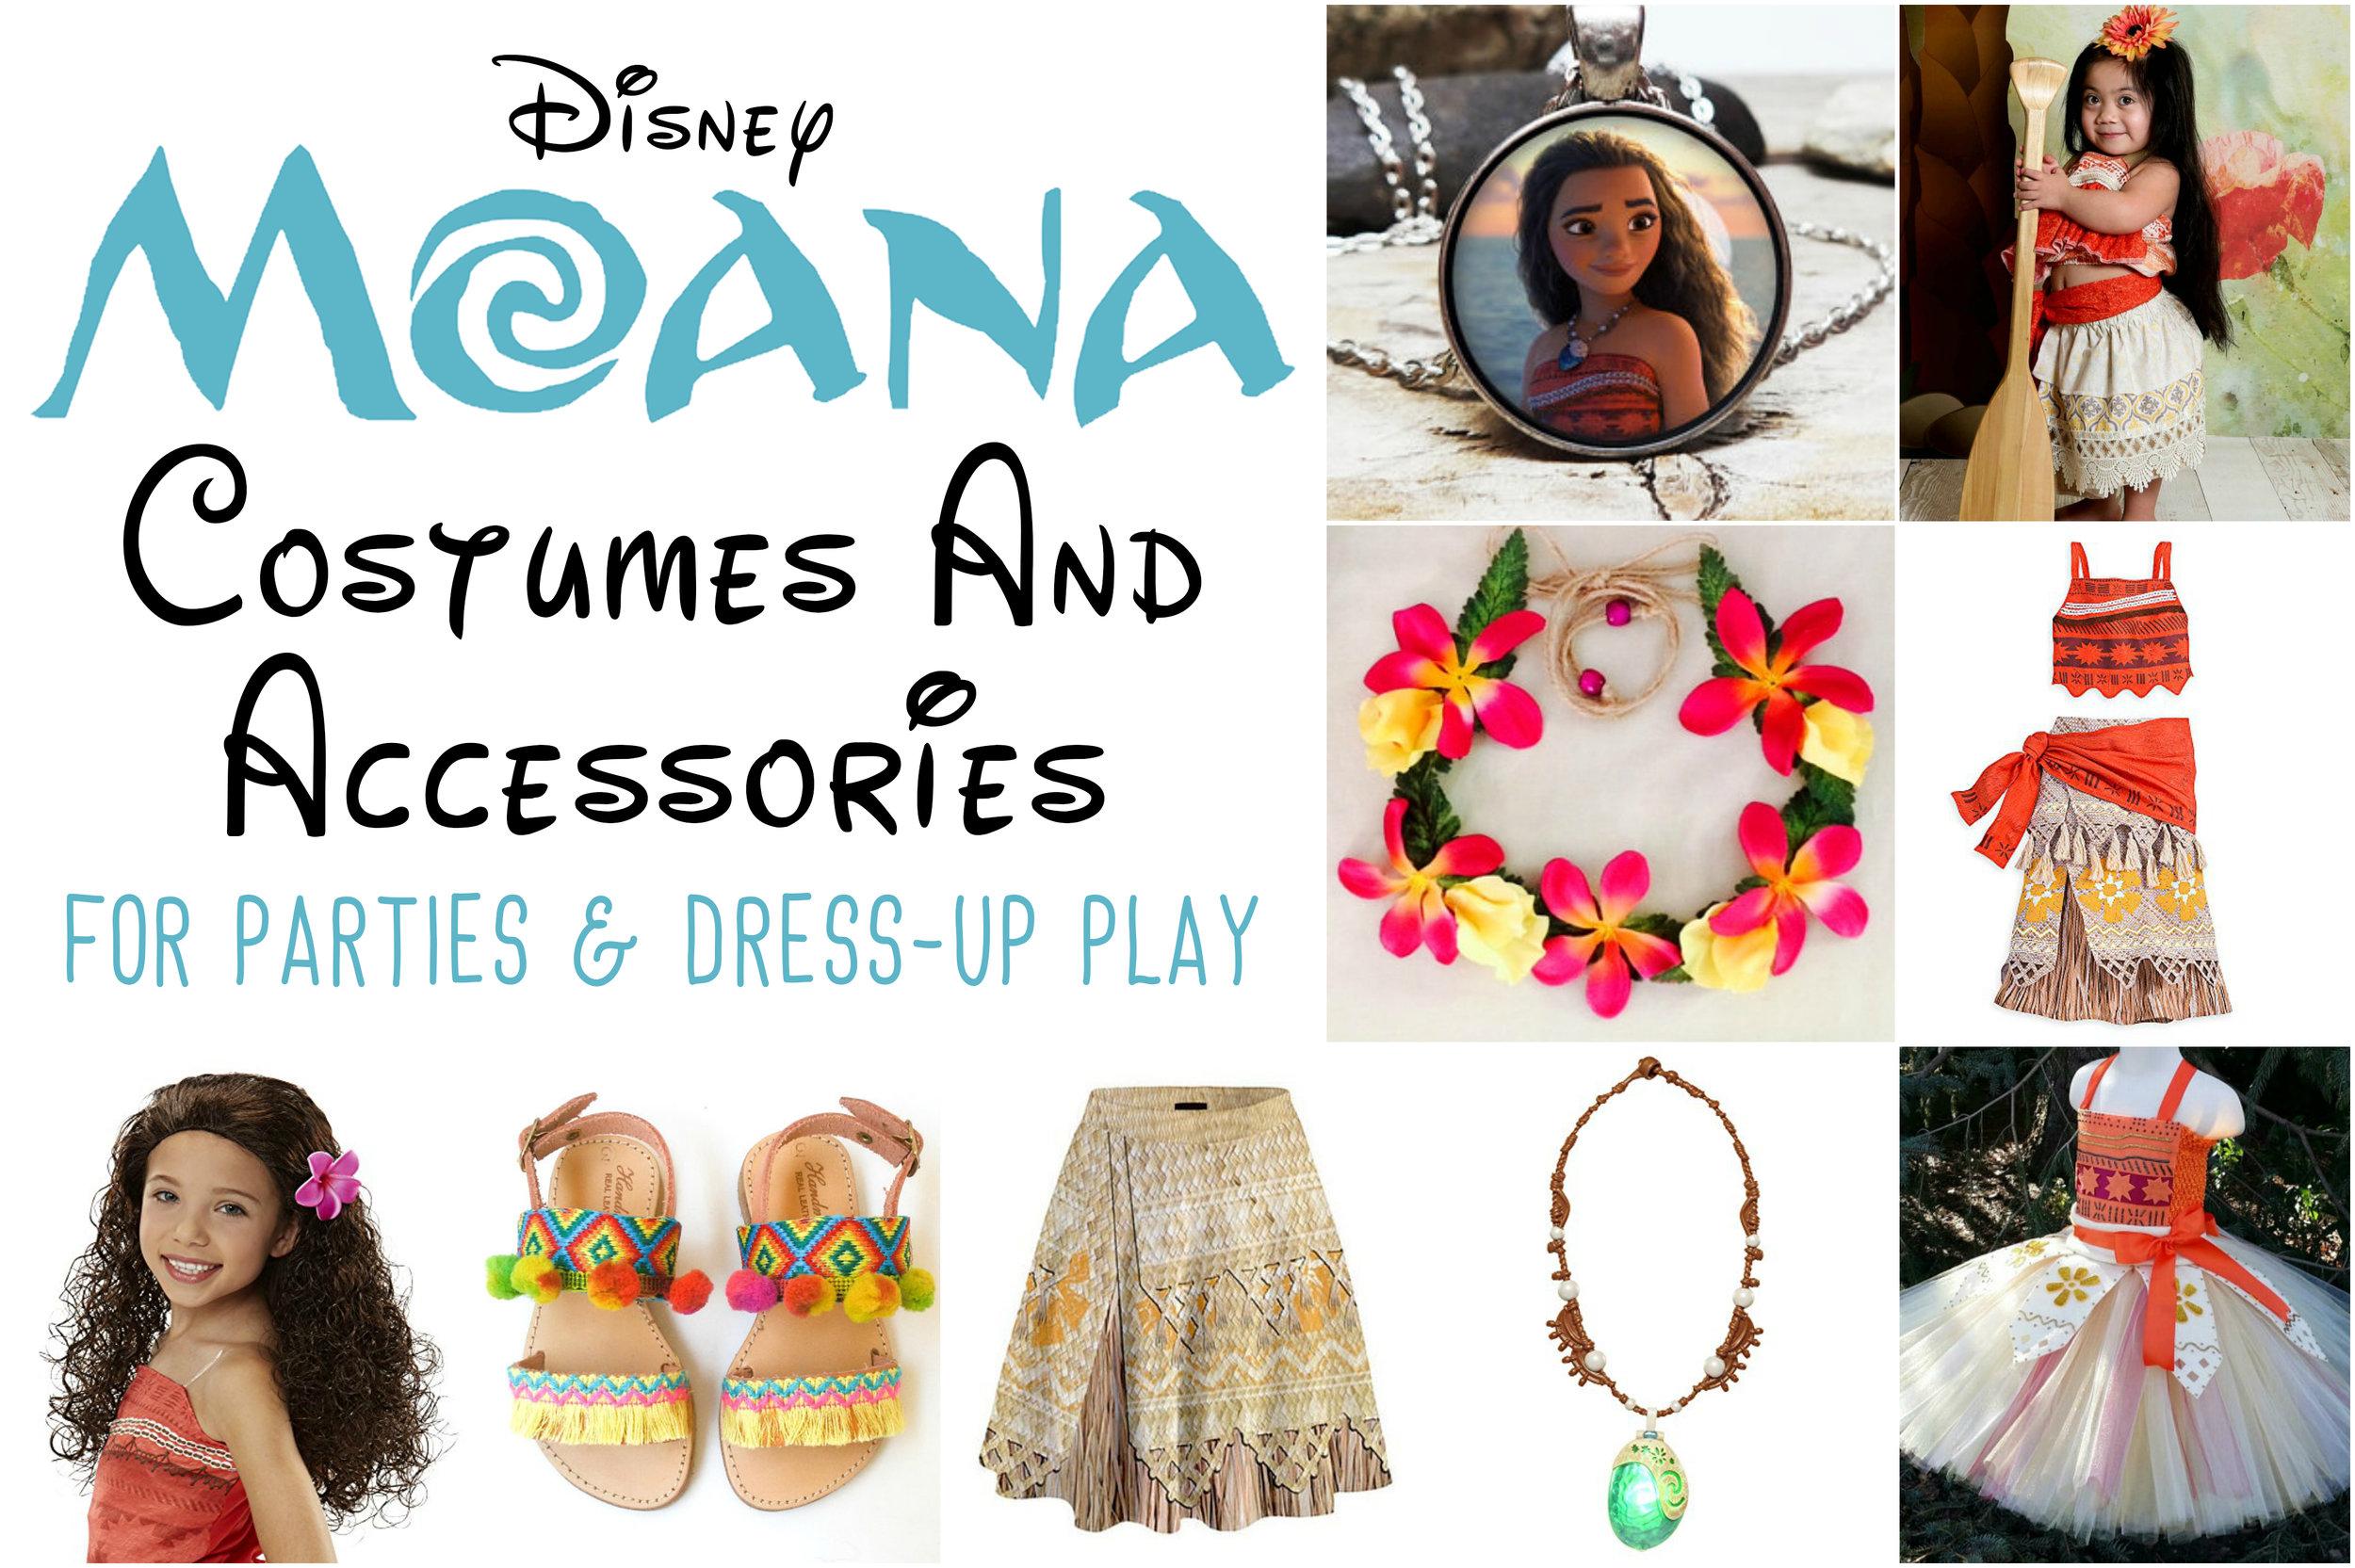 Disney Moana Princess Costumes For Kids